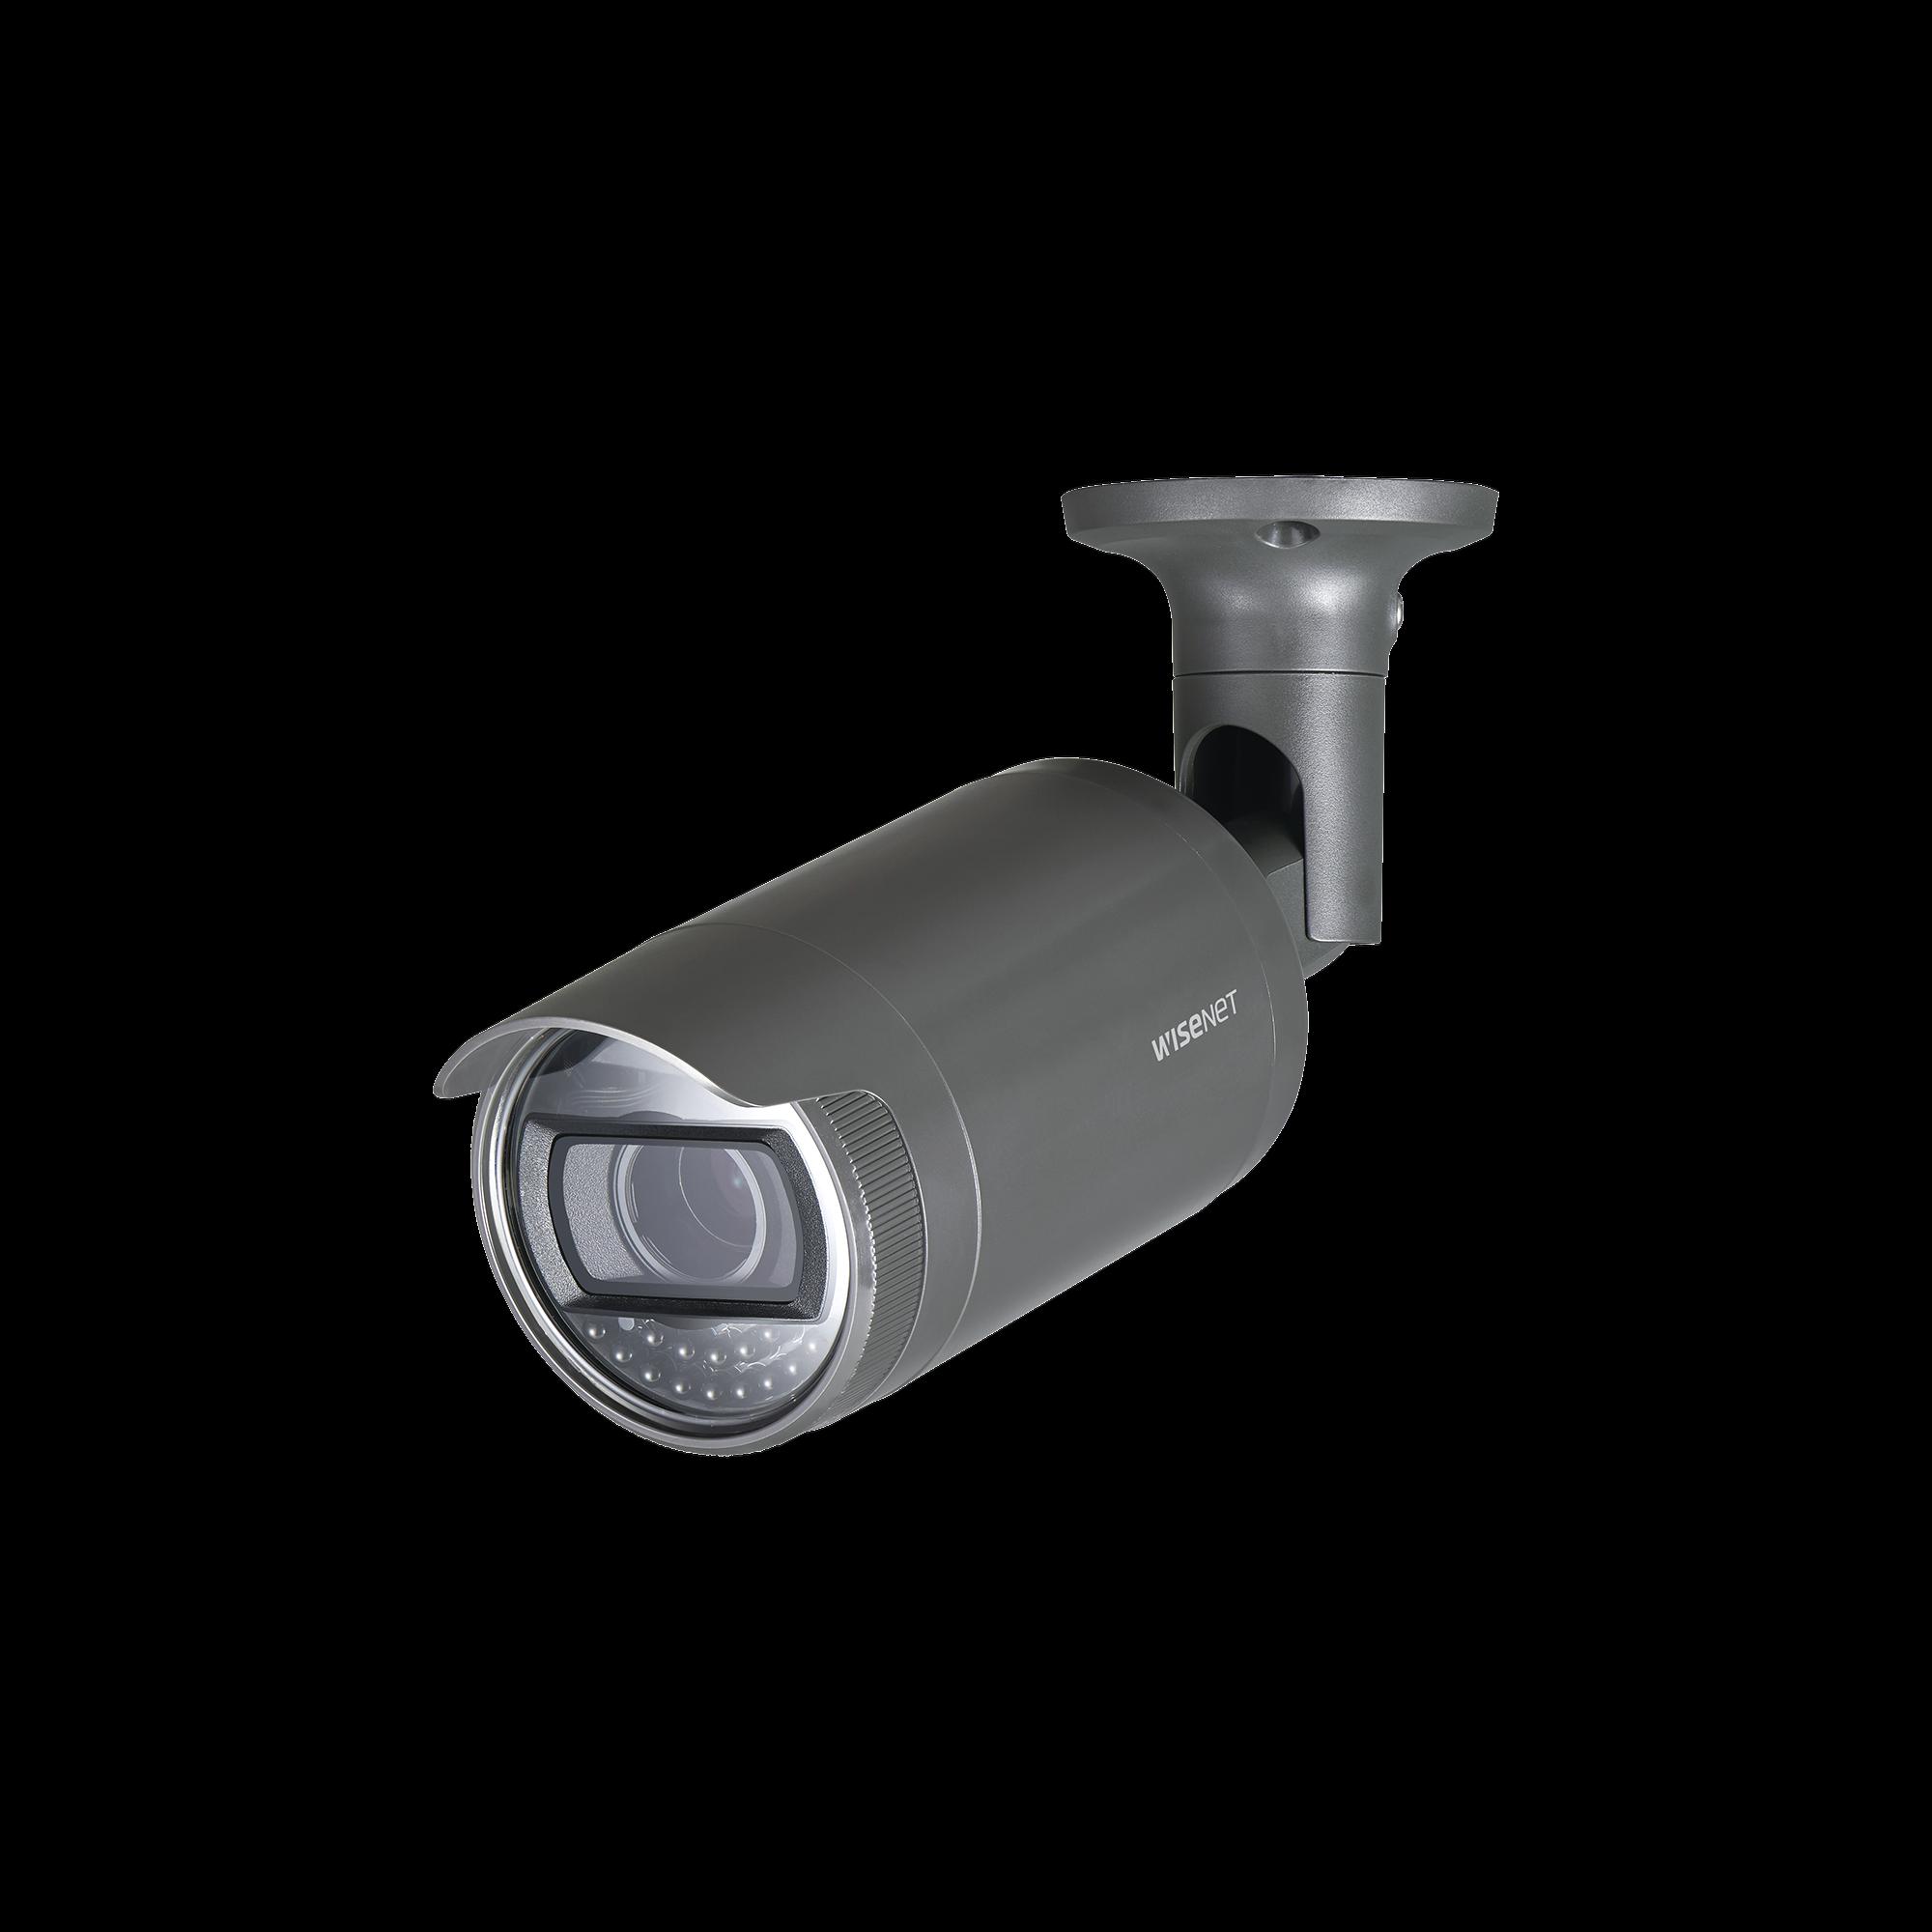 Cámara IP Tipo Bala Exterior 2 Megapíxel / Lente Varifocal 3.2 - 10mm / IR 30M / WDR 120db / IP66